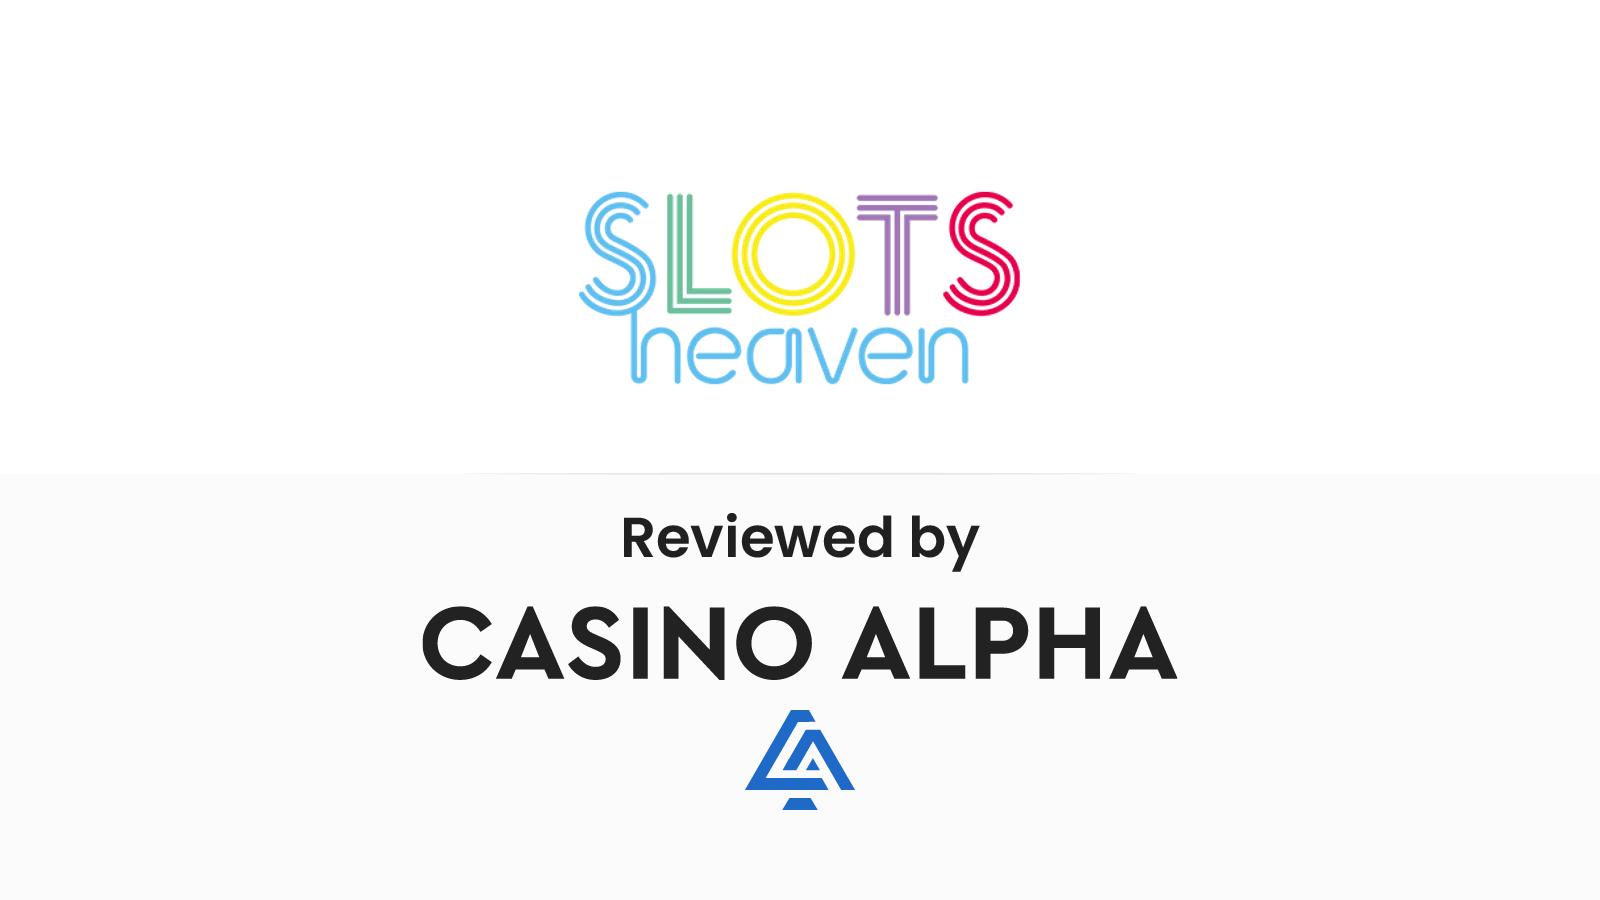 Slots Heaven Review & Promo codes